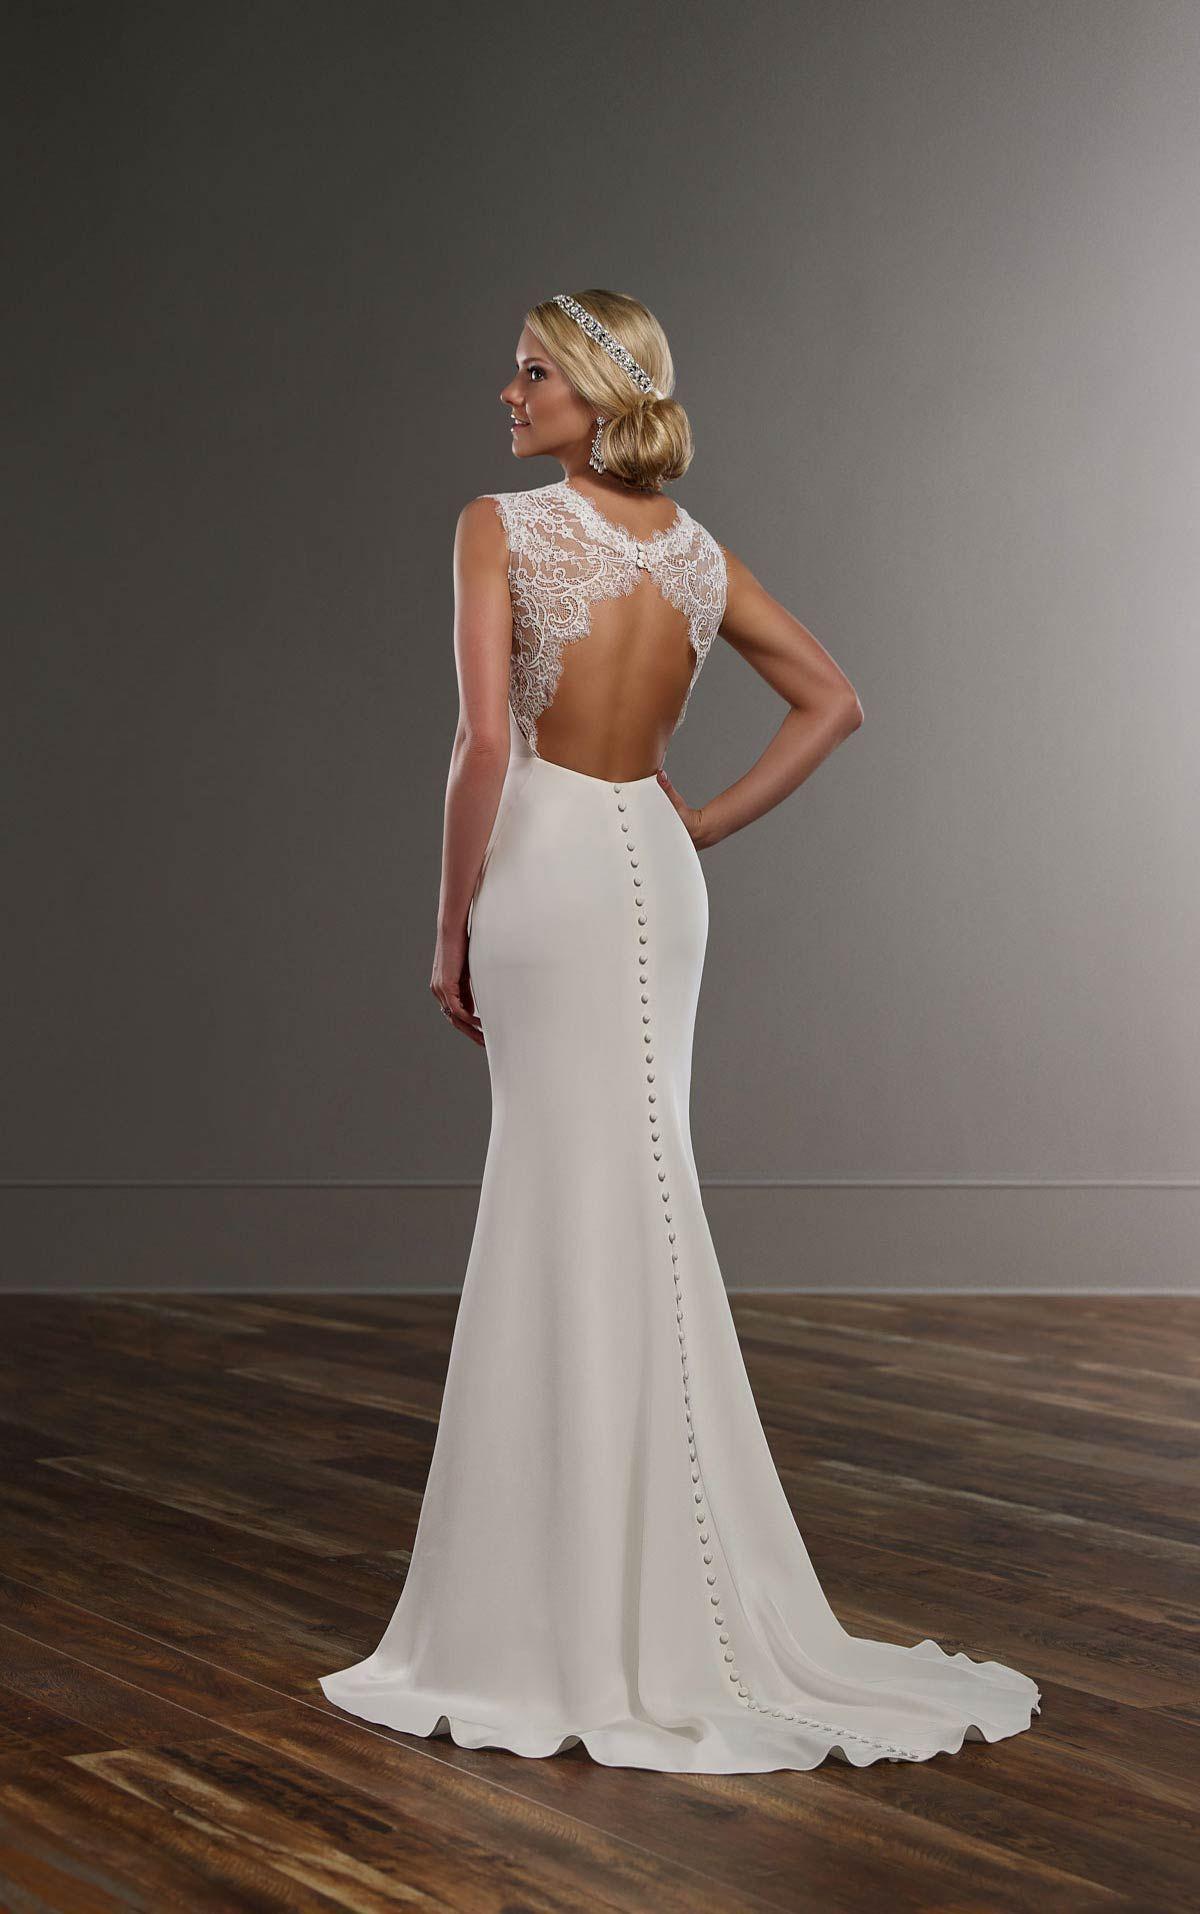 Mermaid wedding dress by wedding sleeve and sexy wedding gowns